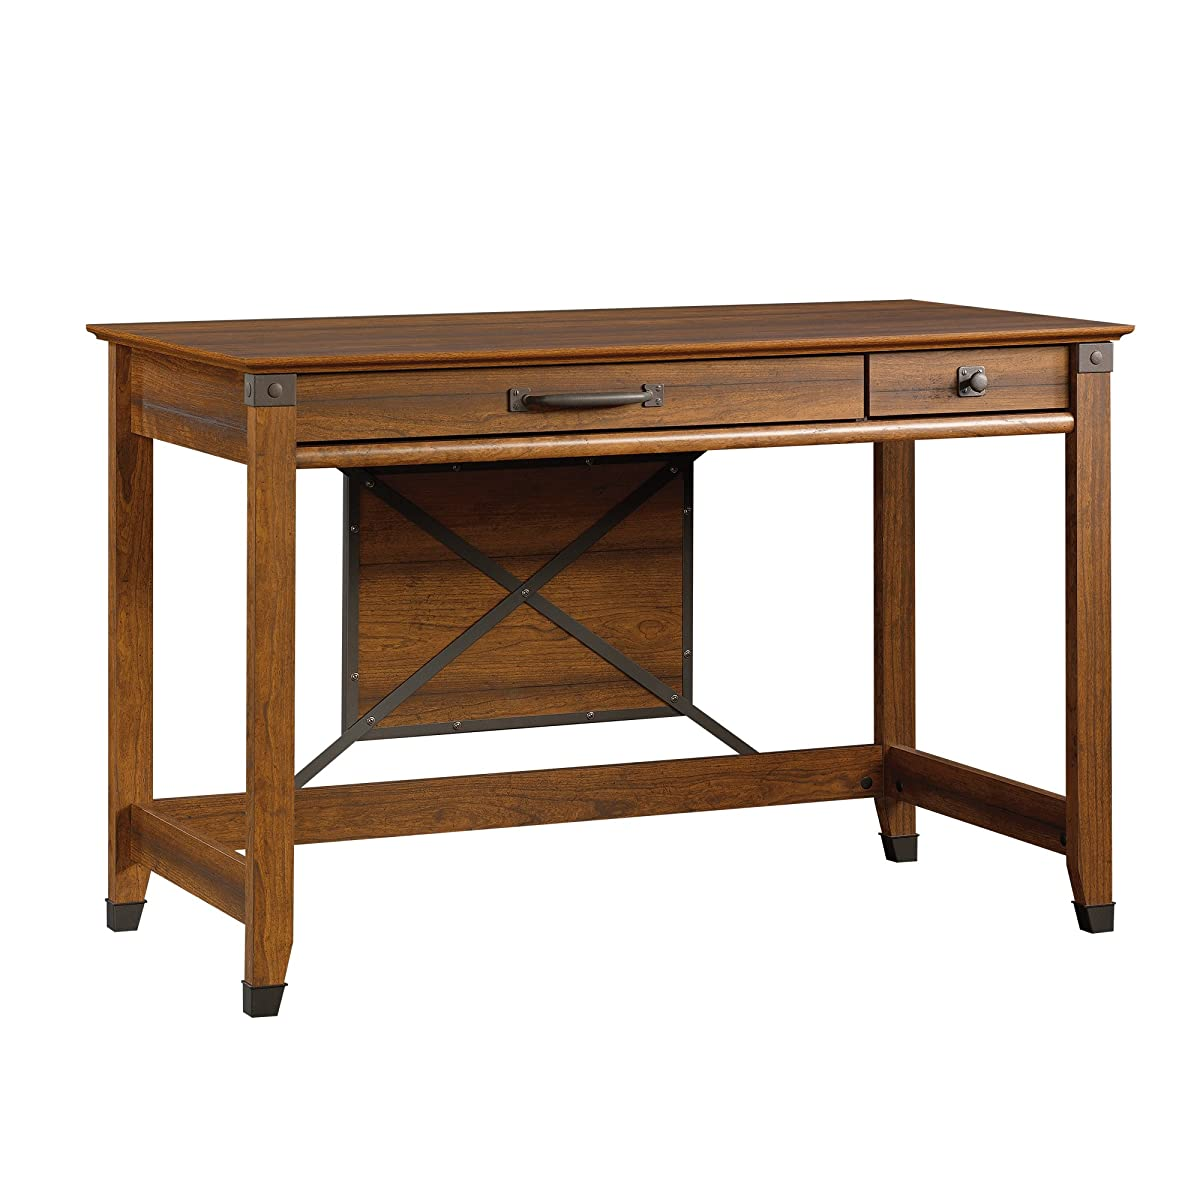 Sauder Carson Forge Writing Desk Washington Cherry Finish